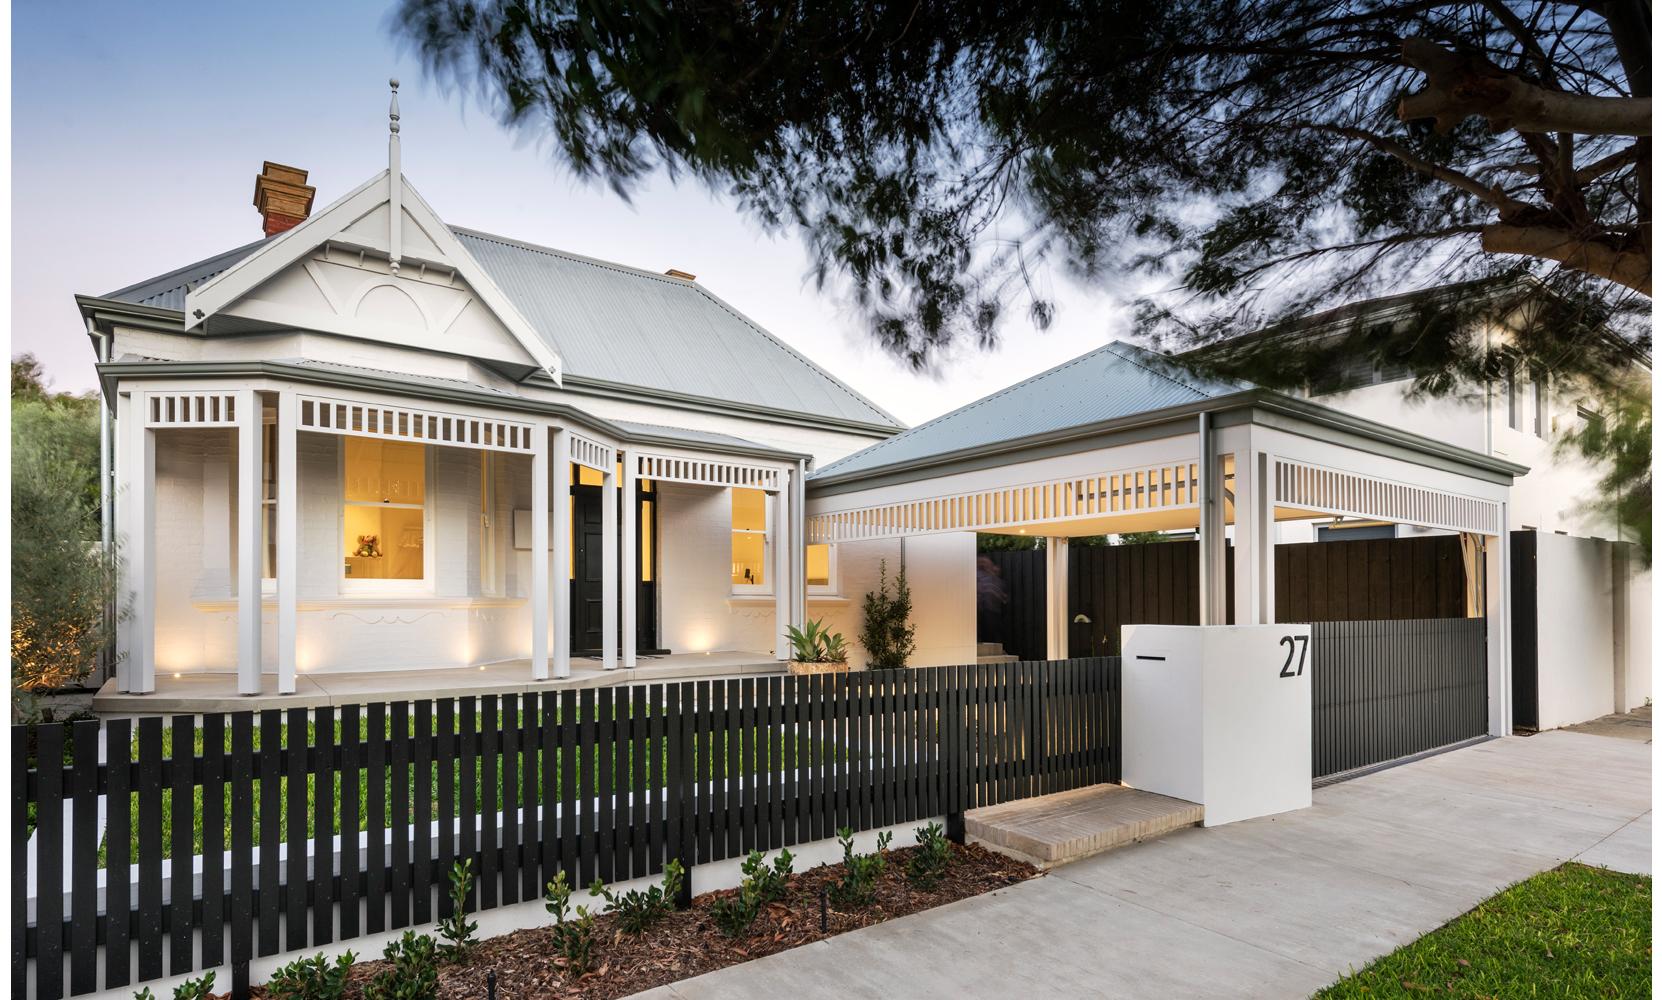 maek-luxury-home-design-inspiration-mosmanpark-27m-gallery-2.jpg